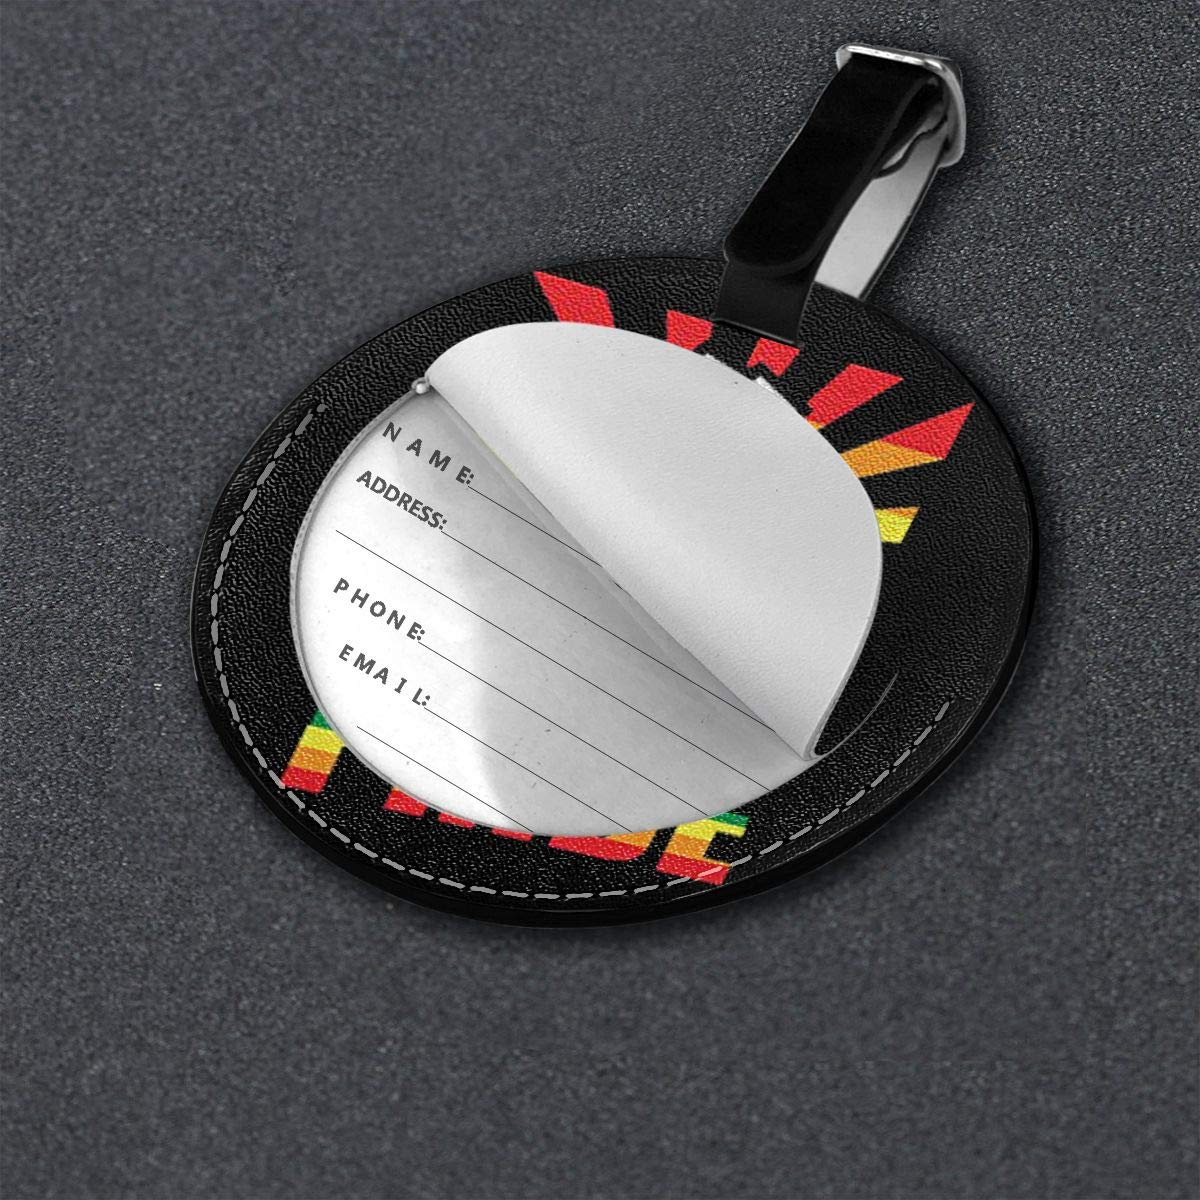 Free-2 LGBT Gay Pride Pride Fist Luggage Tag 3D Print Leather Travel Bag ID Card